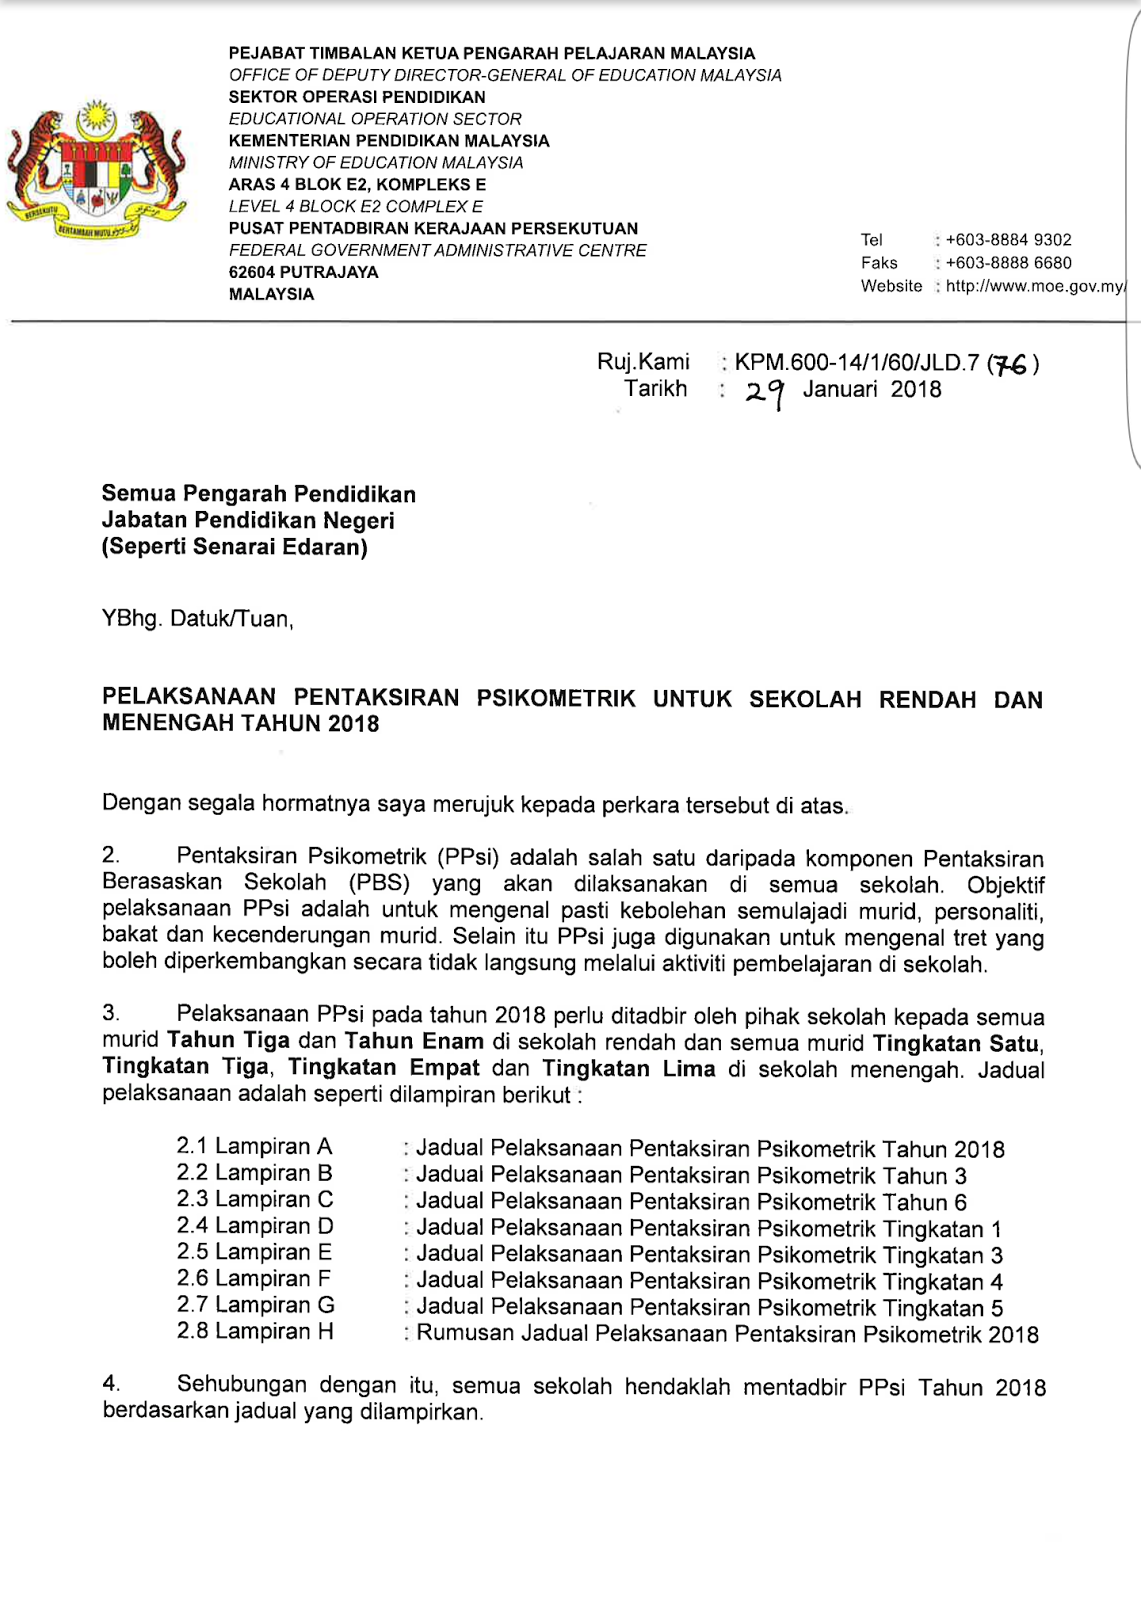 Kaunselor Nurhaiza Che Mat Jadual Perlaksanaan Pentaksiran Psikometrik 2018